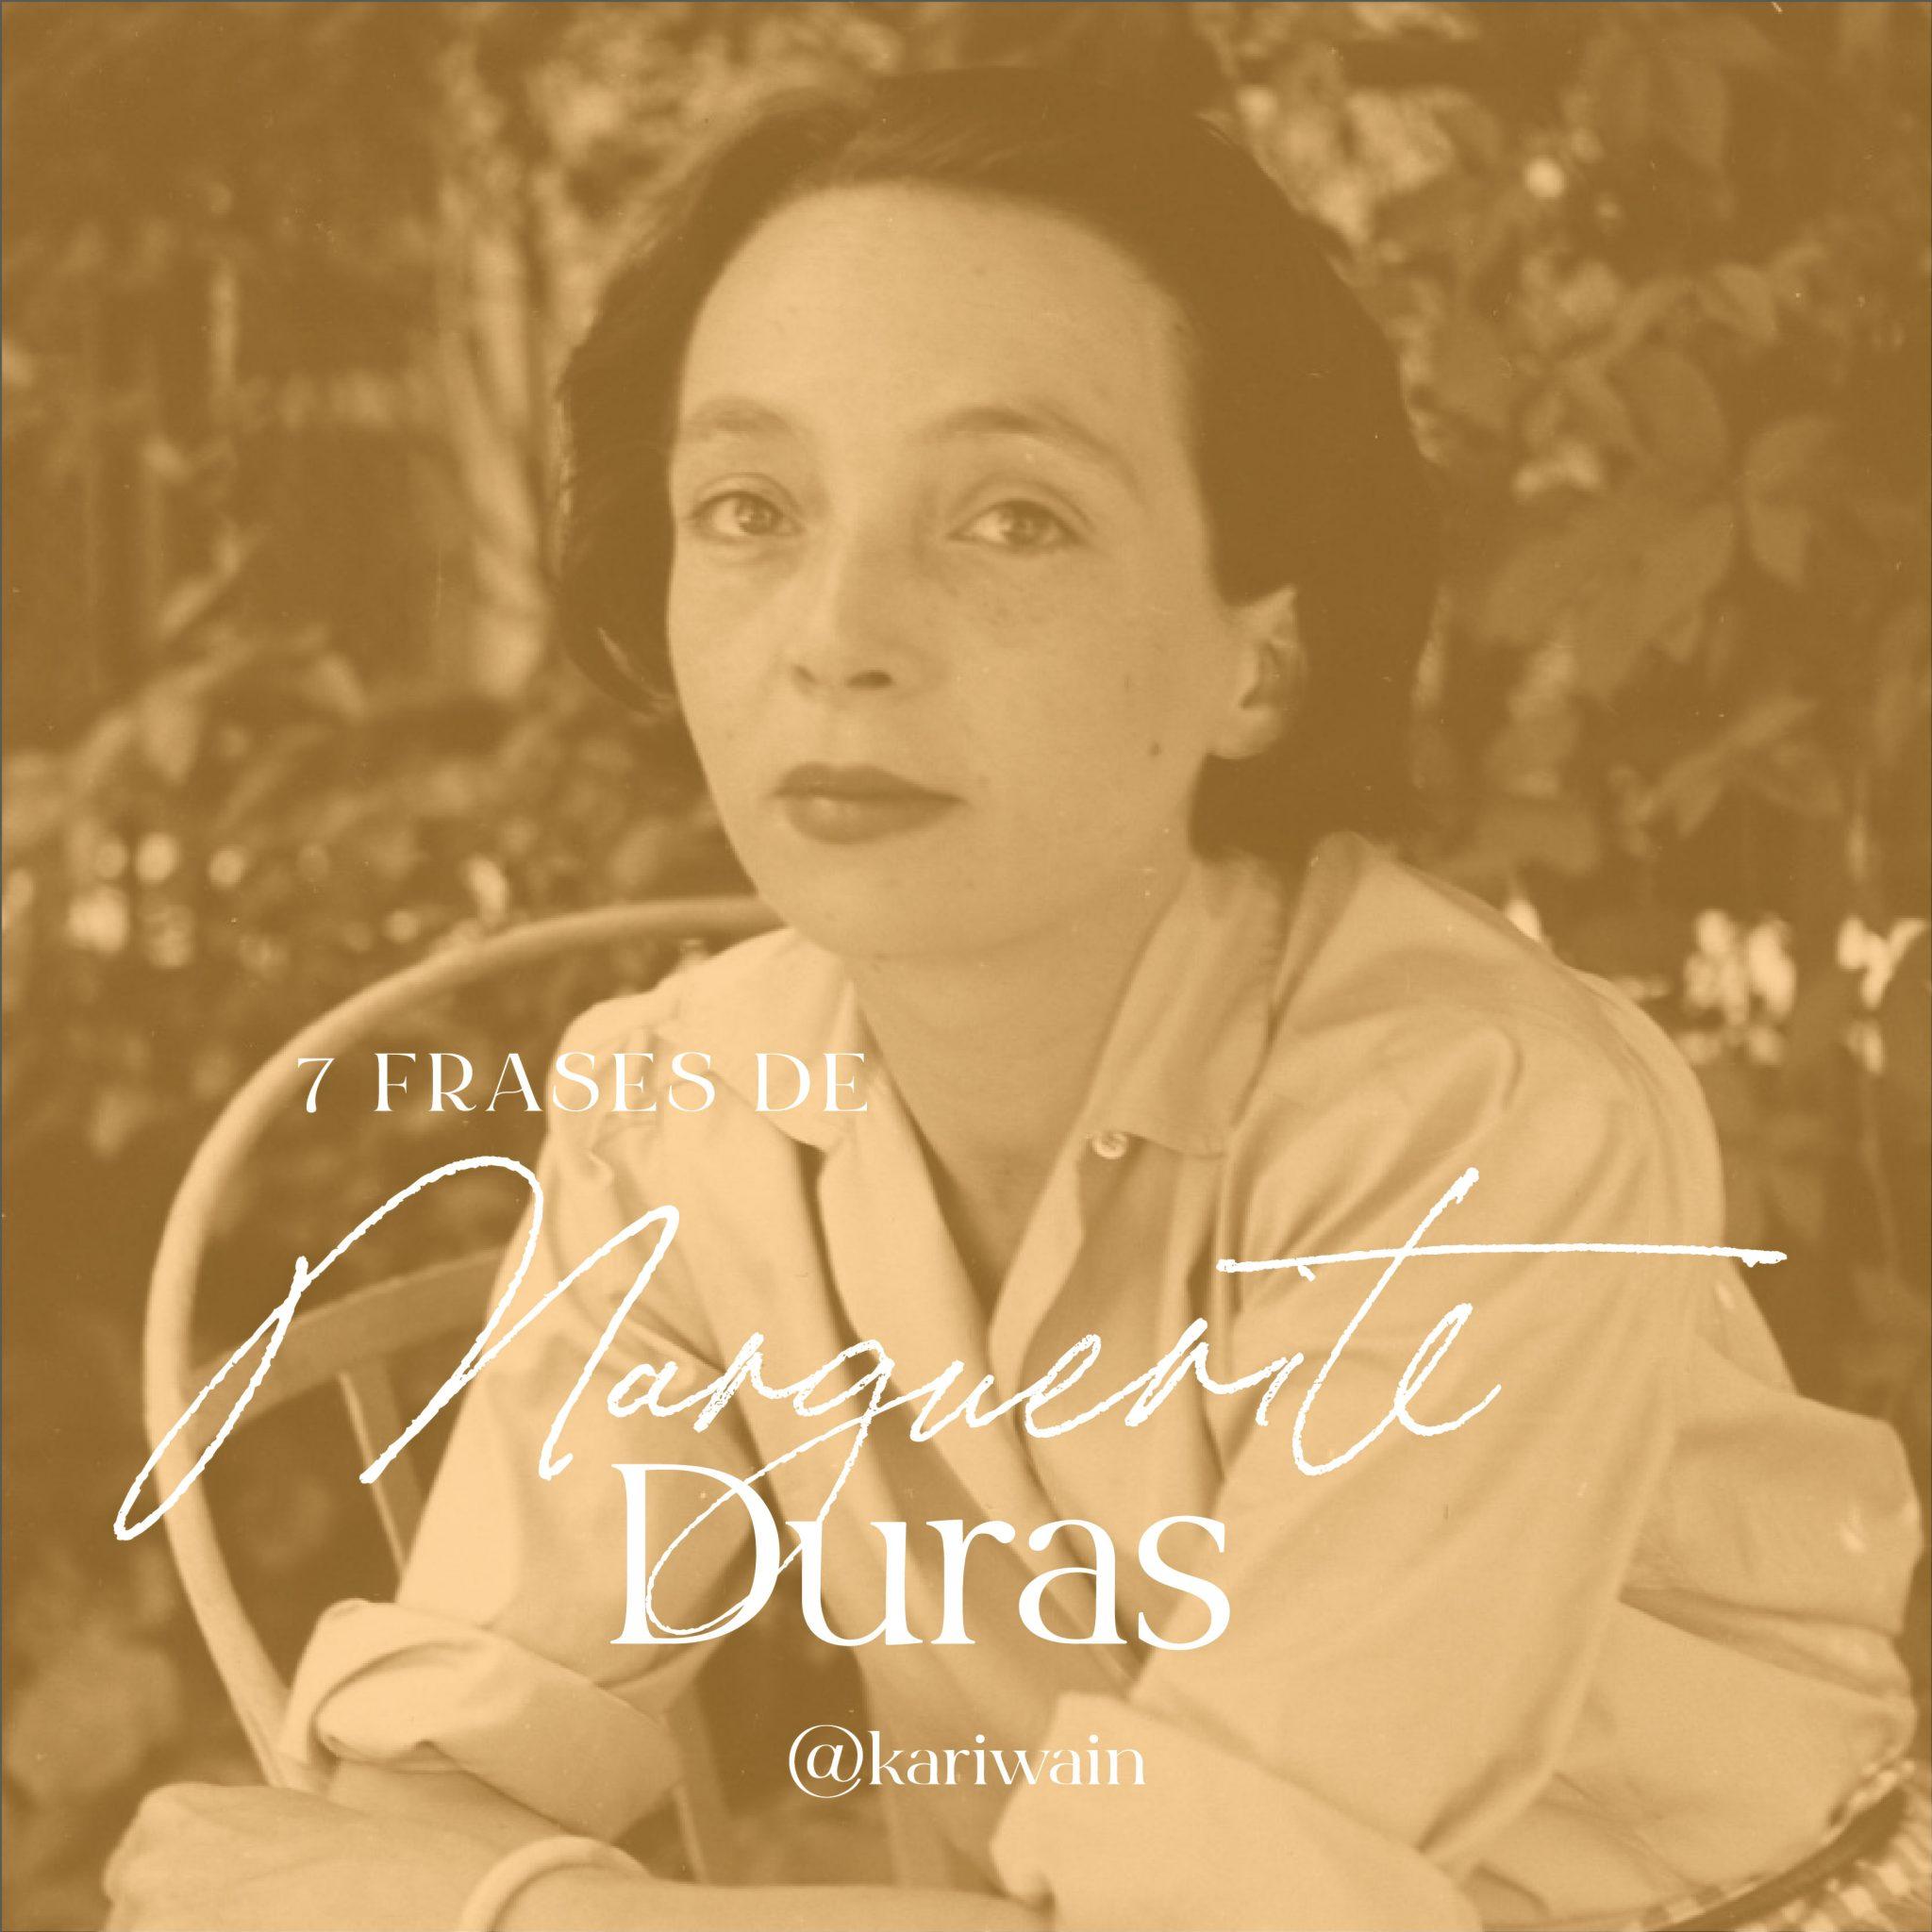 Frases de Marguerite Duras